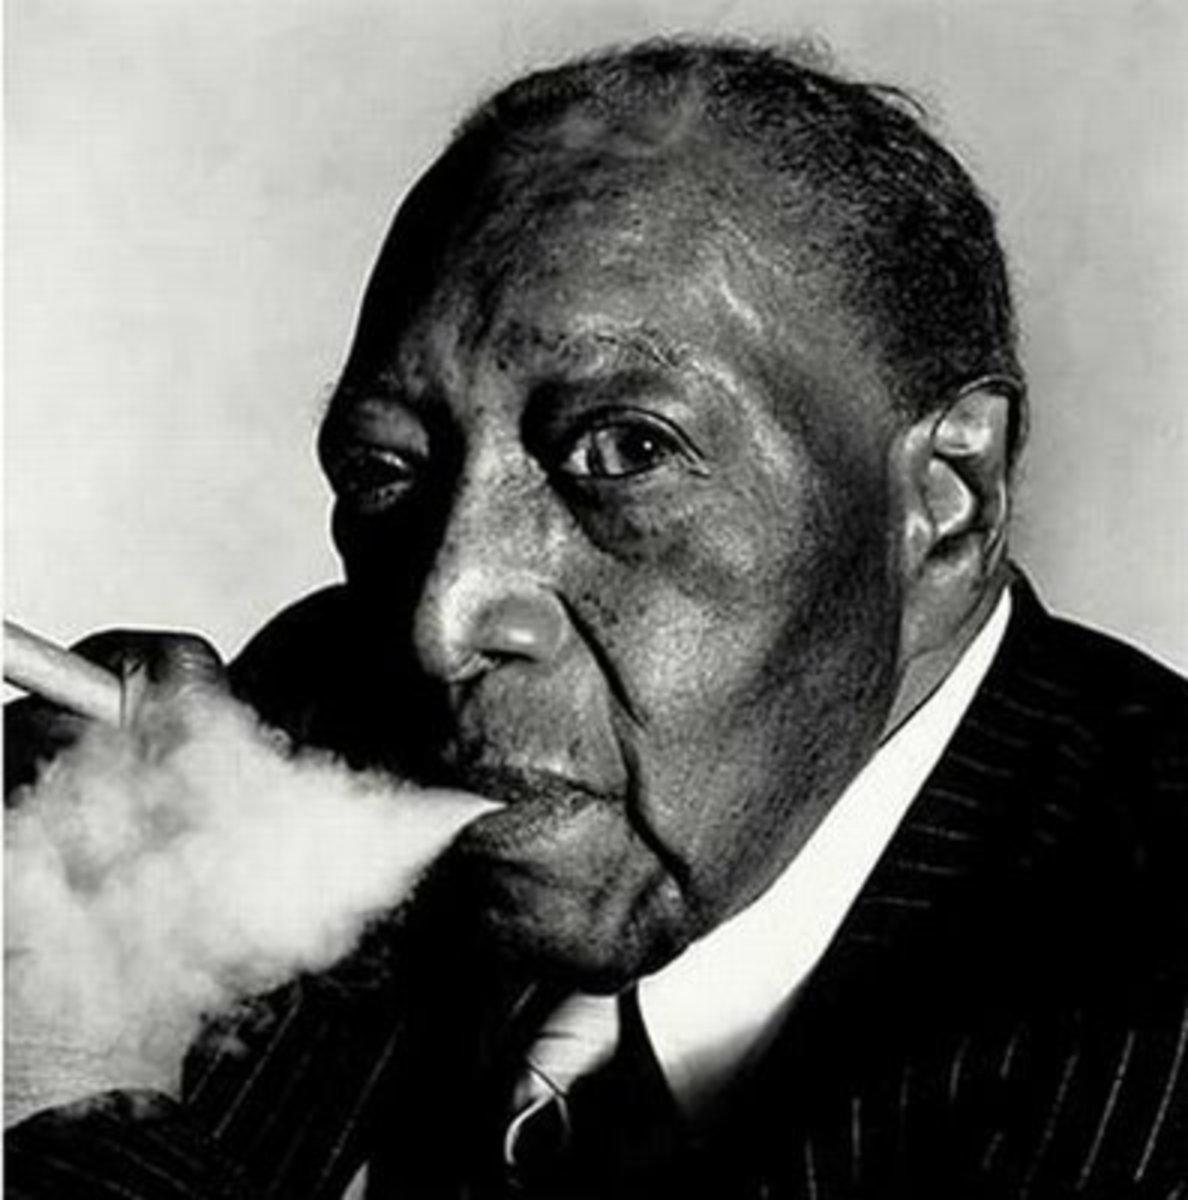 James VanDerZee, Harlem Photographer